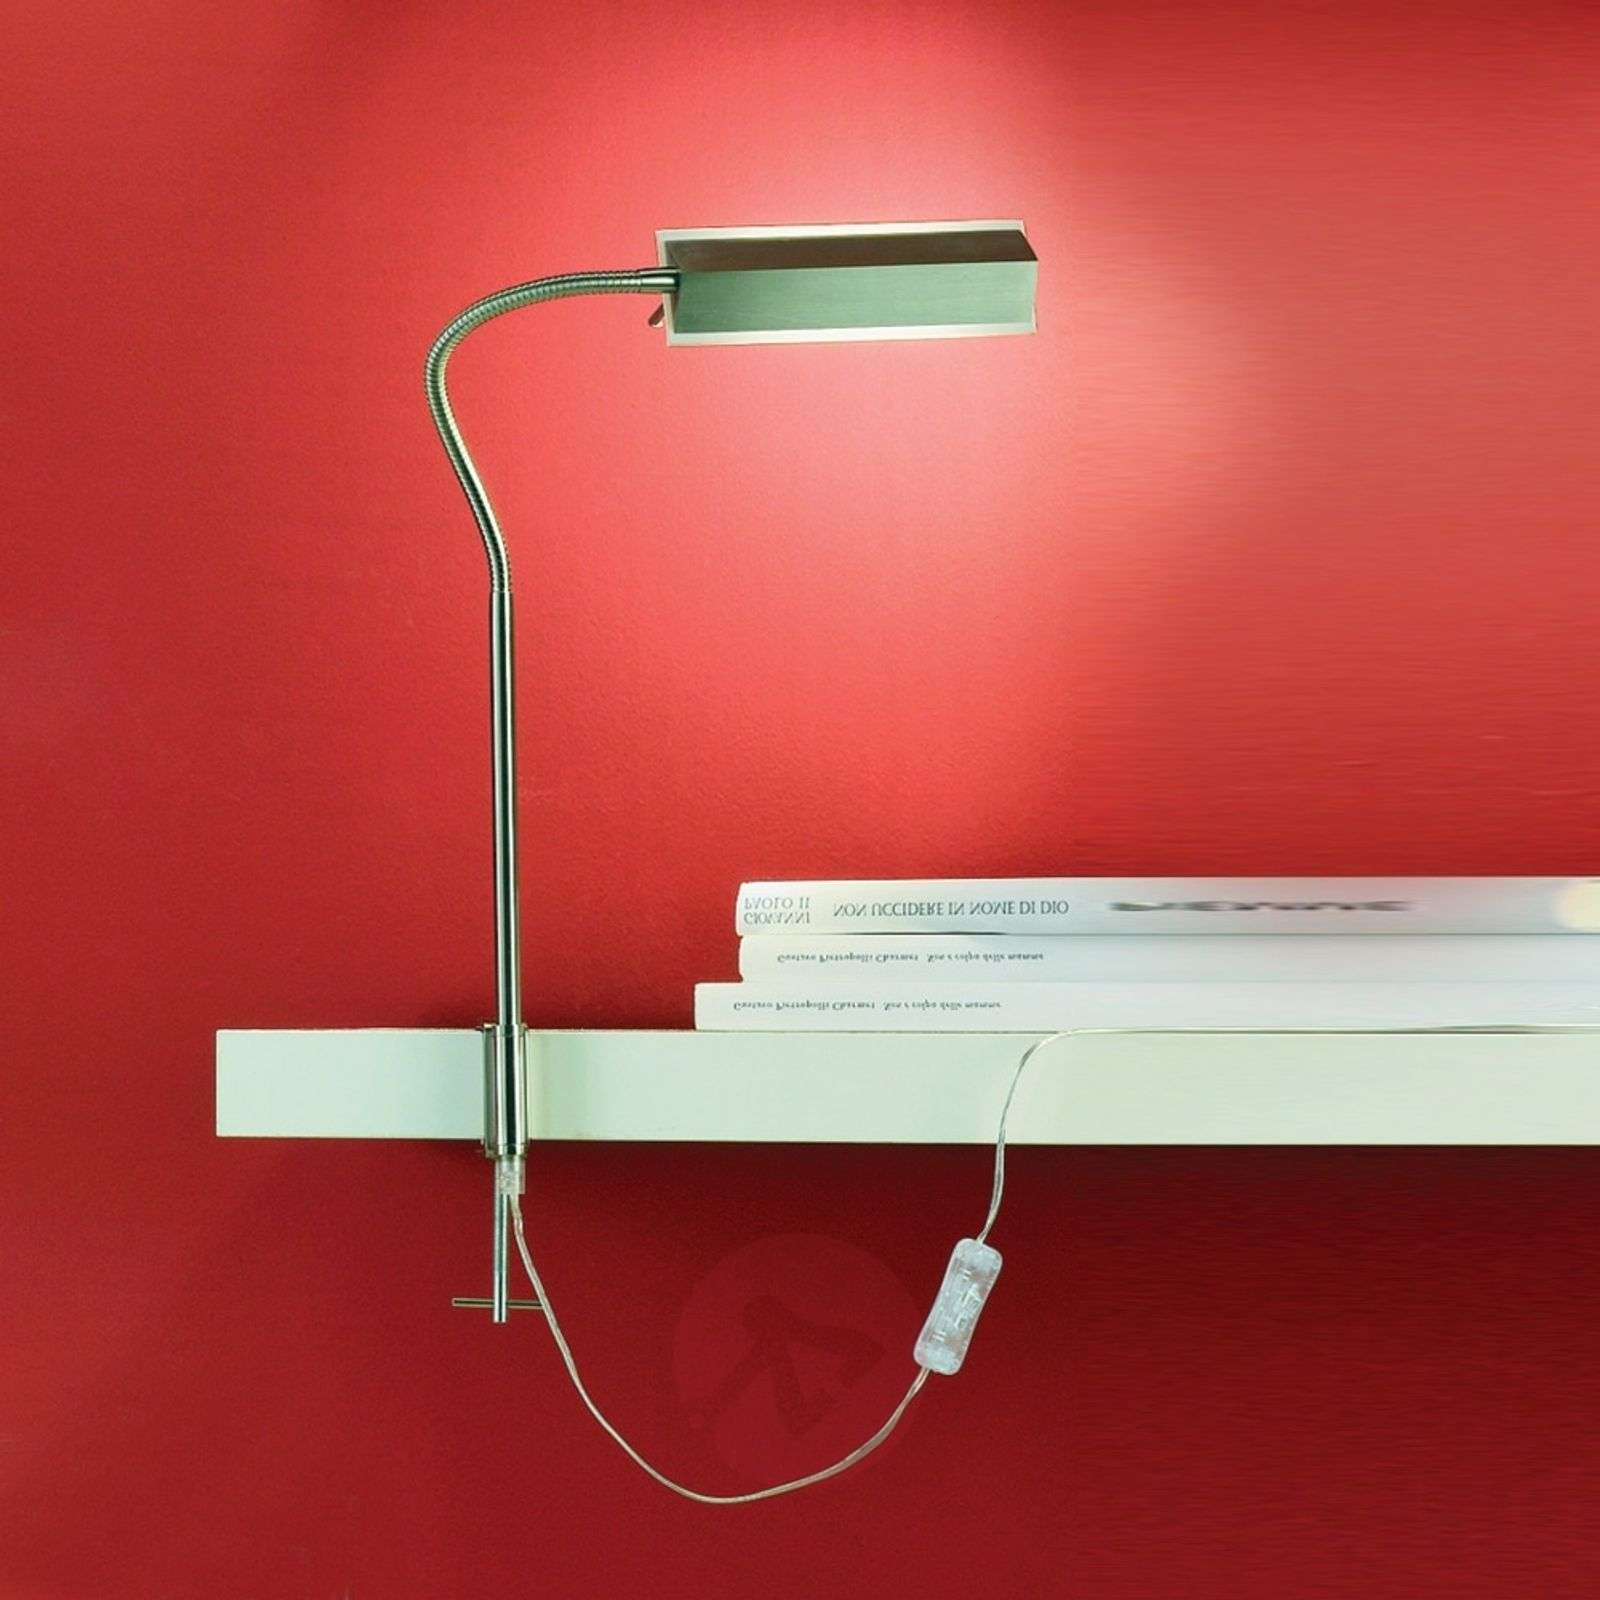 stand home lights clamp work lighting on task luxury best of agilux idea light